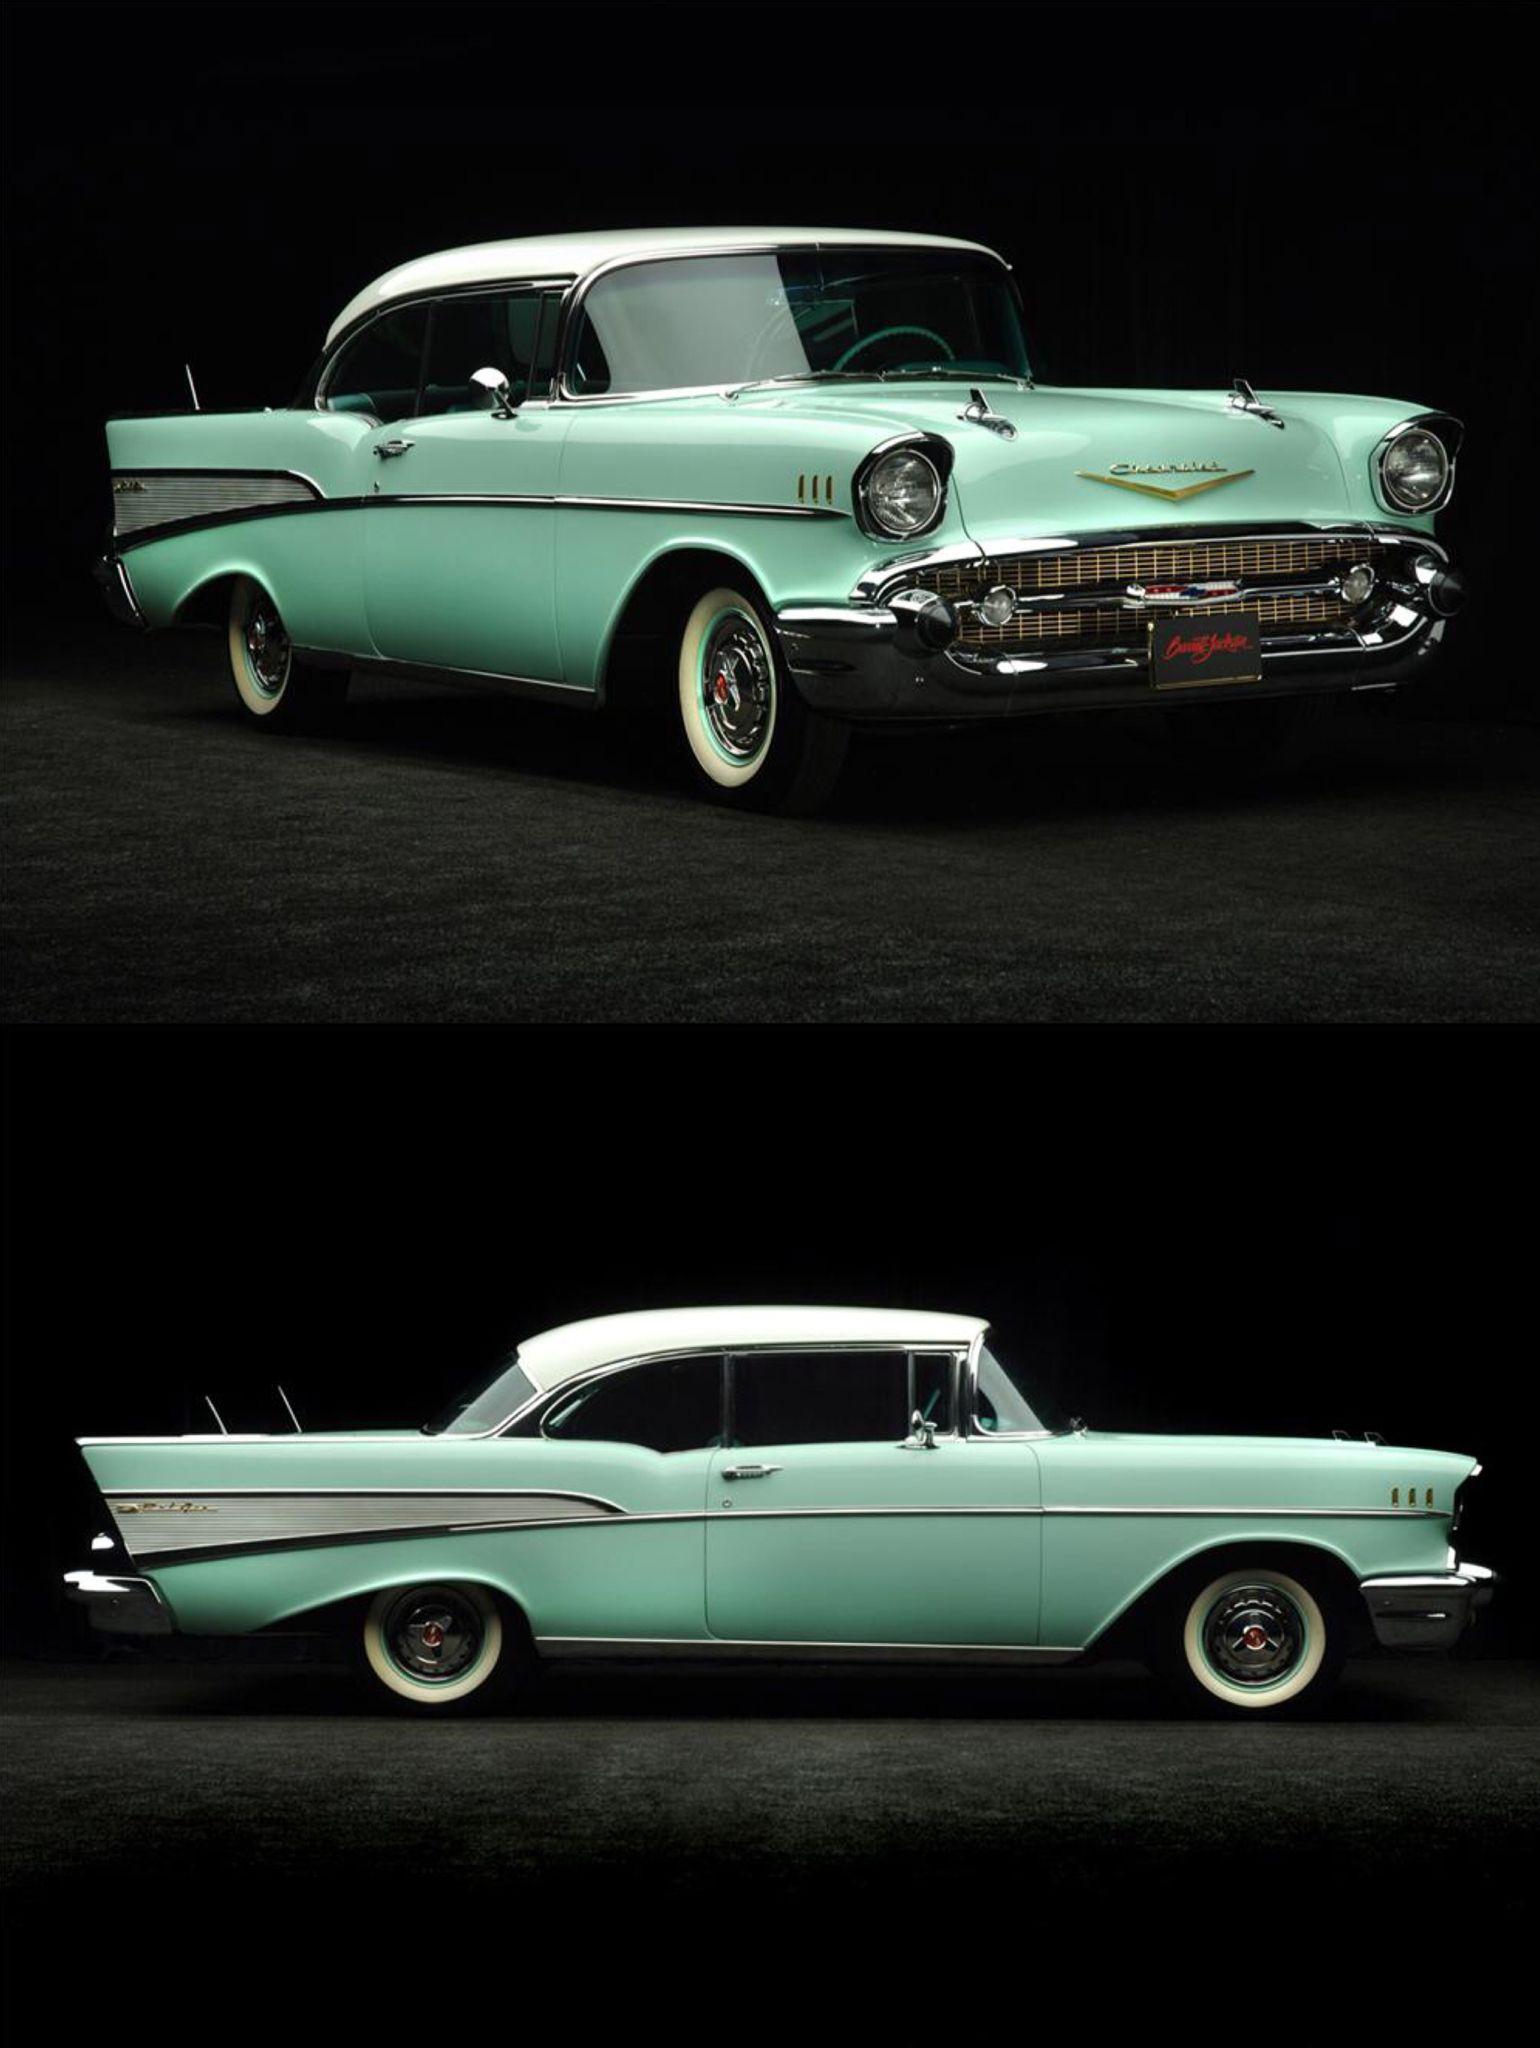 1957 Spring Mint Green Bel Air Car 1957 Chevrolet Chevrolet Bel Air Chevrolet